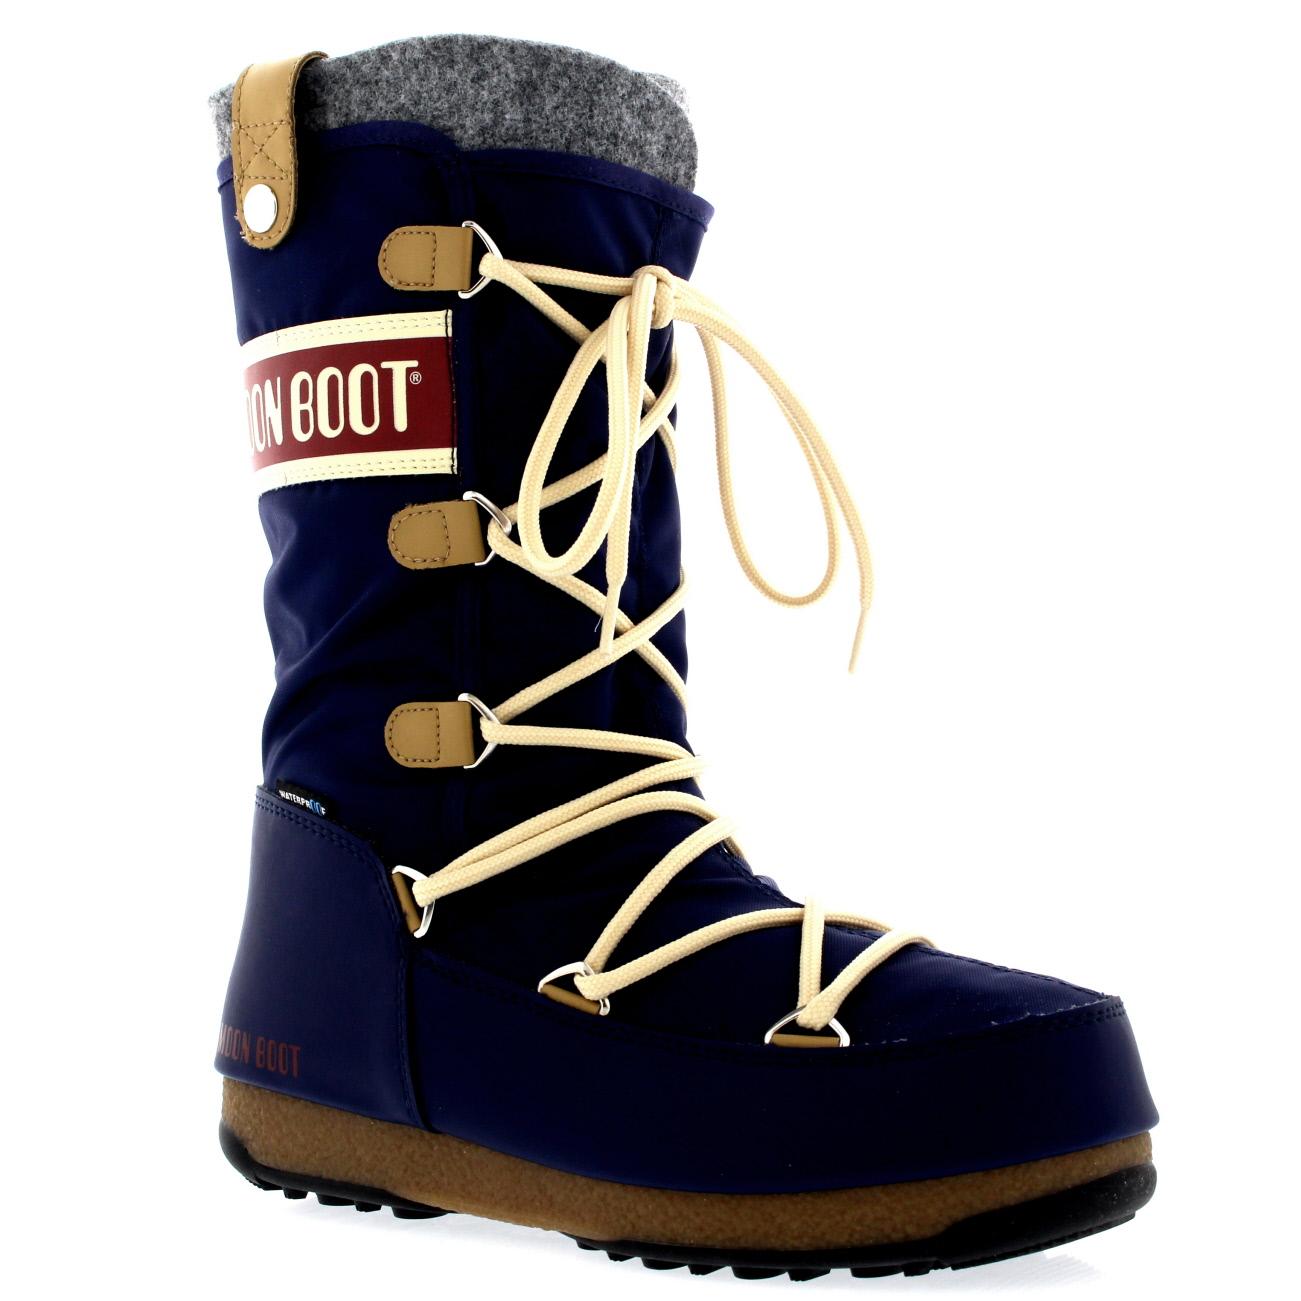 Womens Tecnica Original Moon Boot Monaco Felt Waterproof